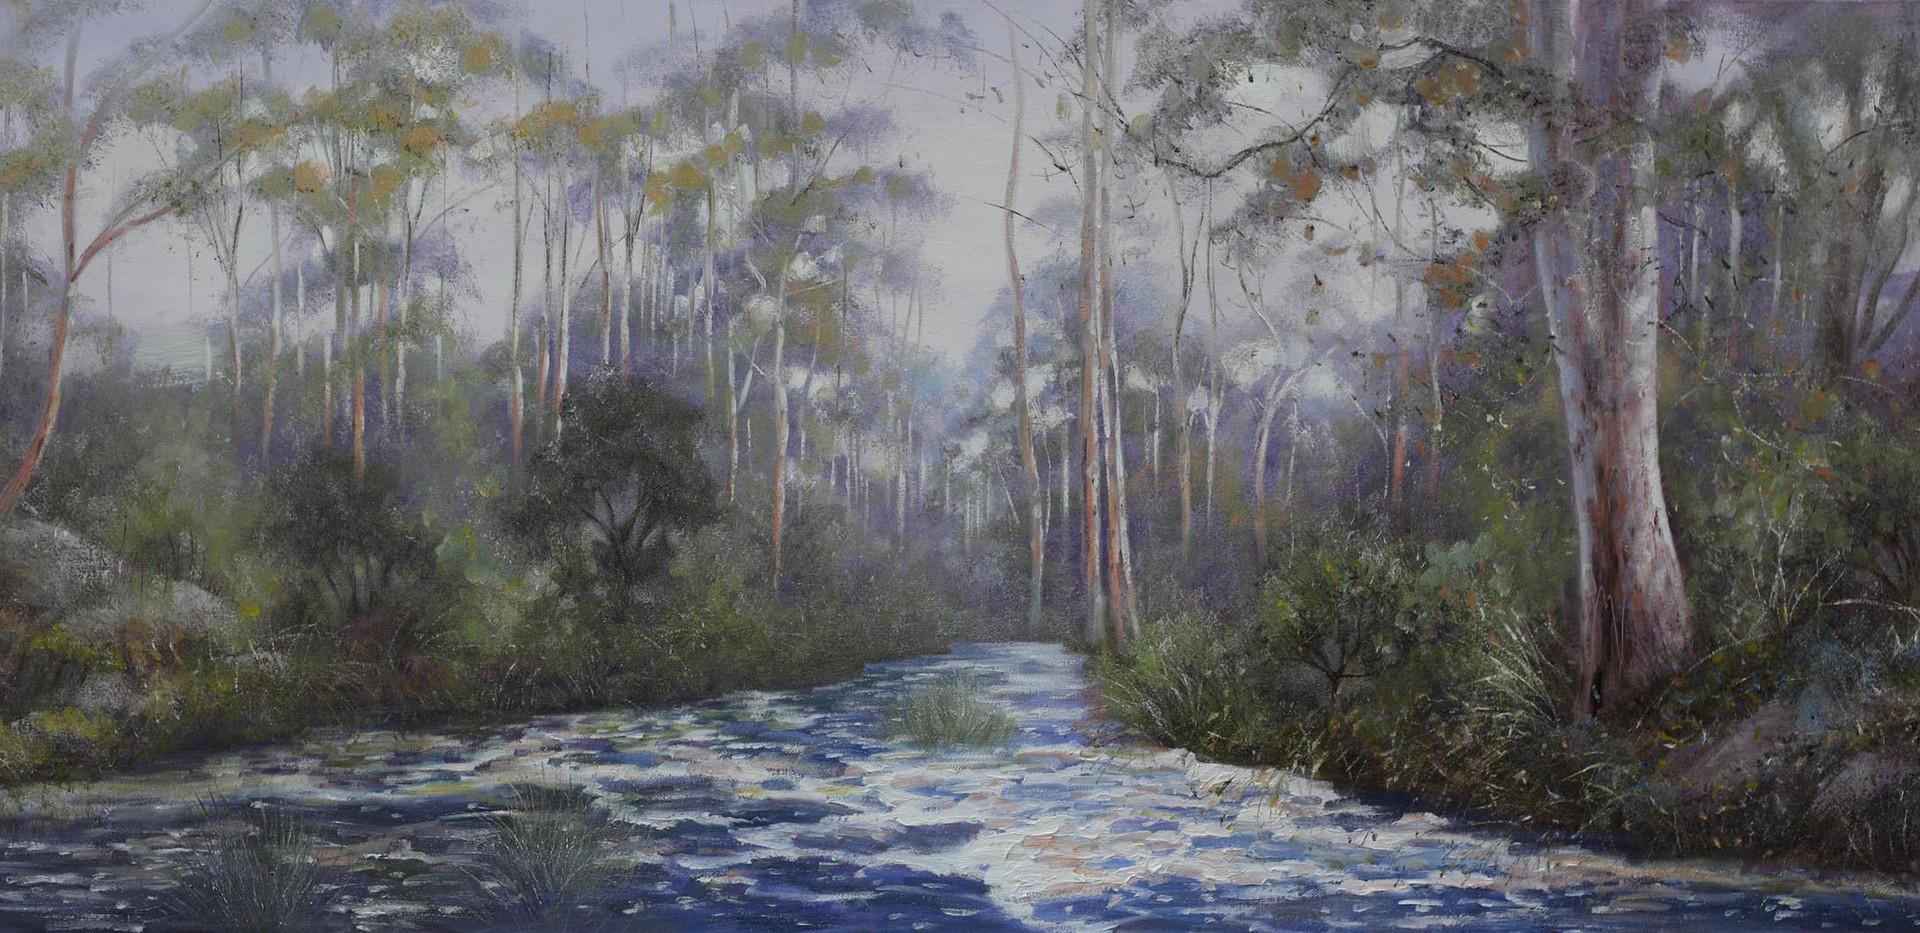 'After The Rains' 152cm x 61cm Sold